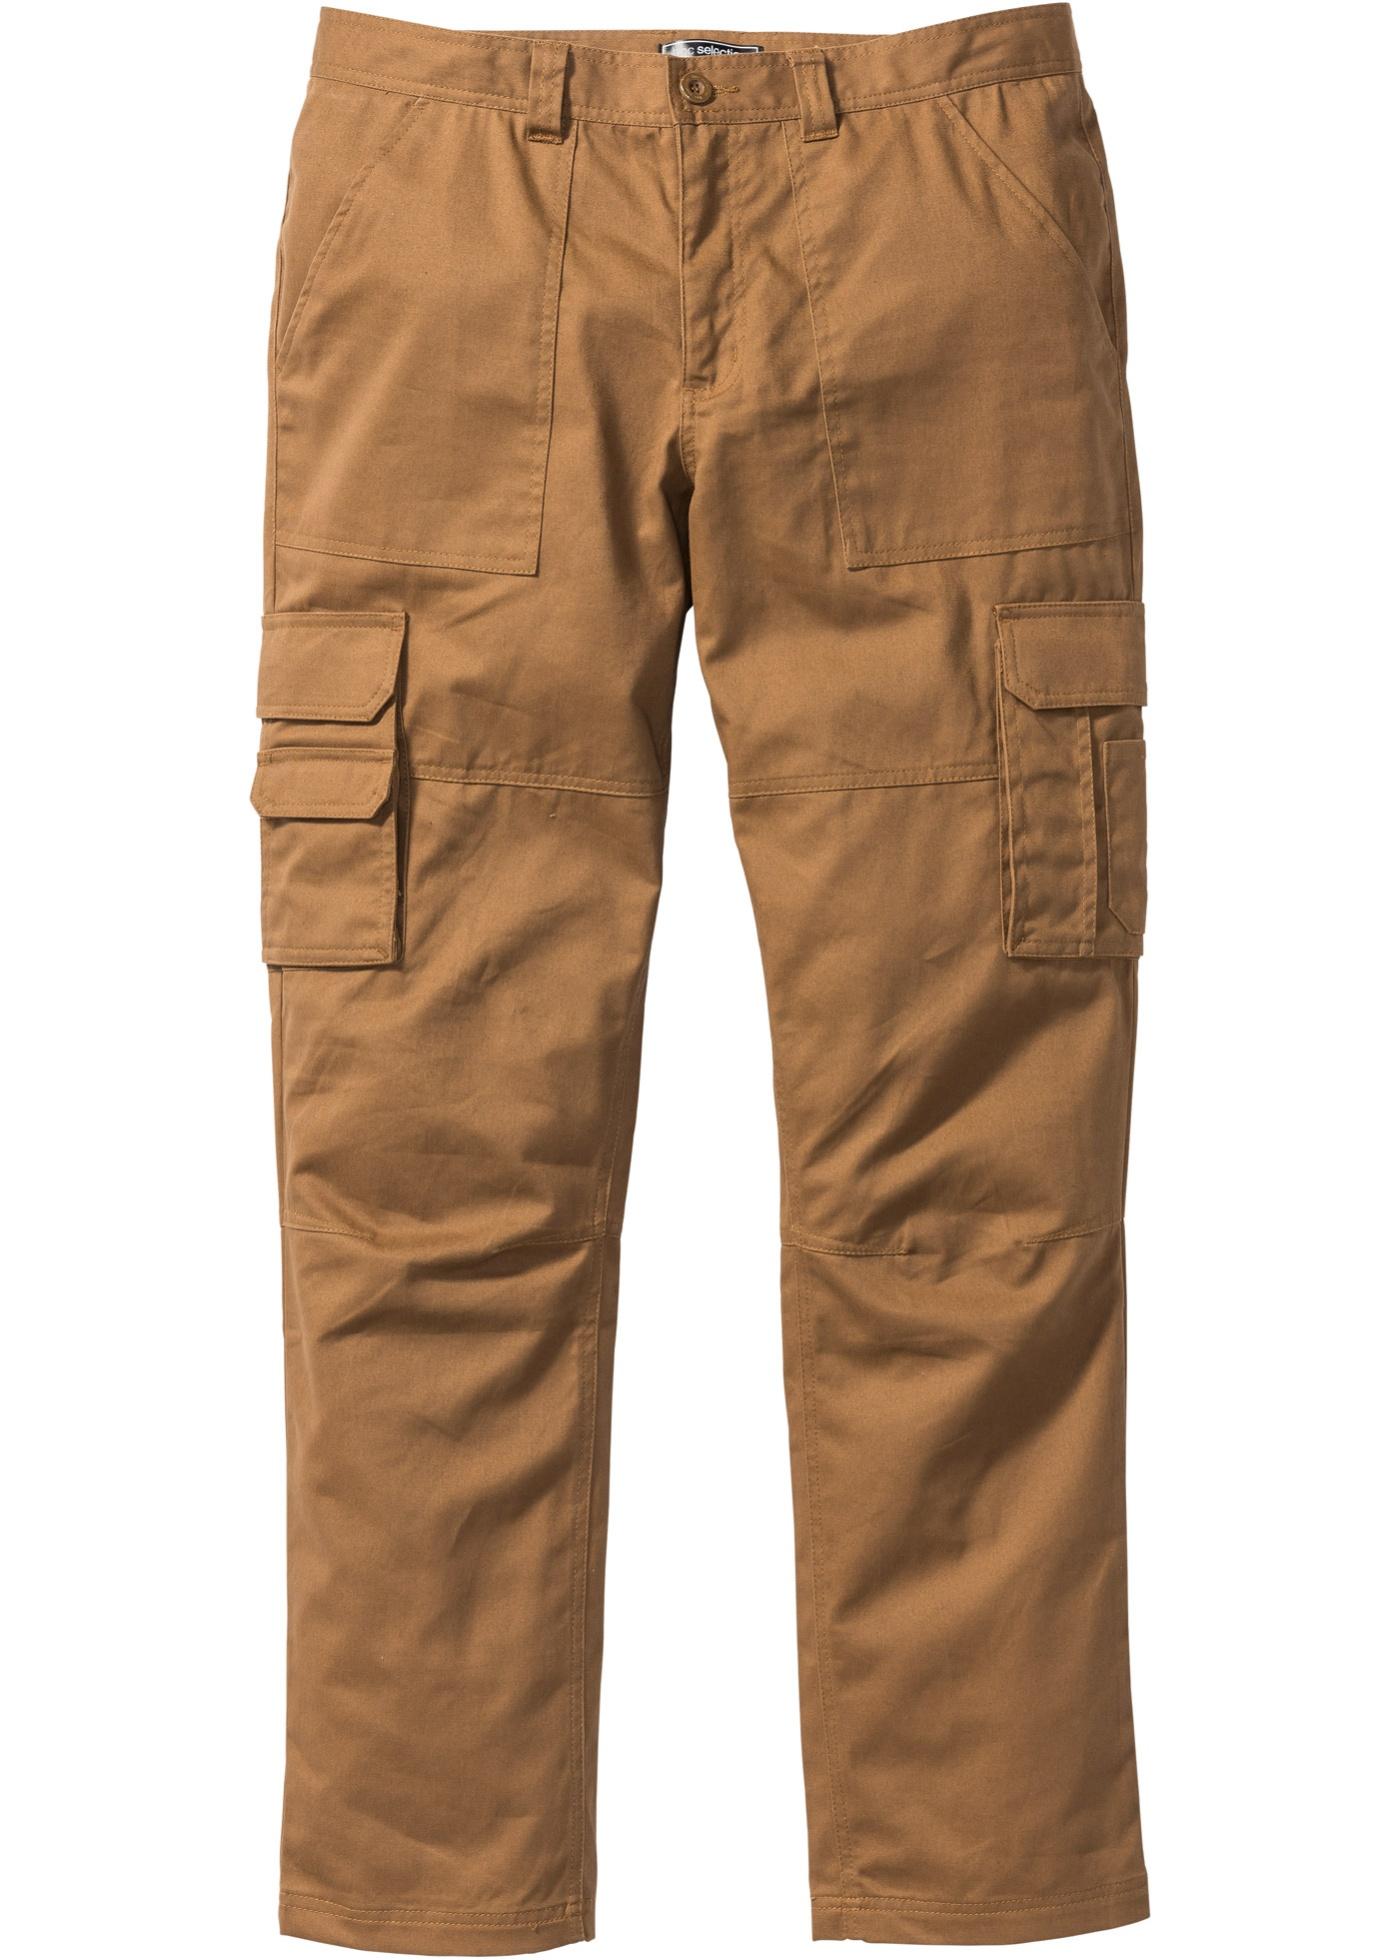 Kargo kalhoty Regular Fit Straight - Hnědá